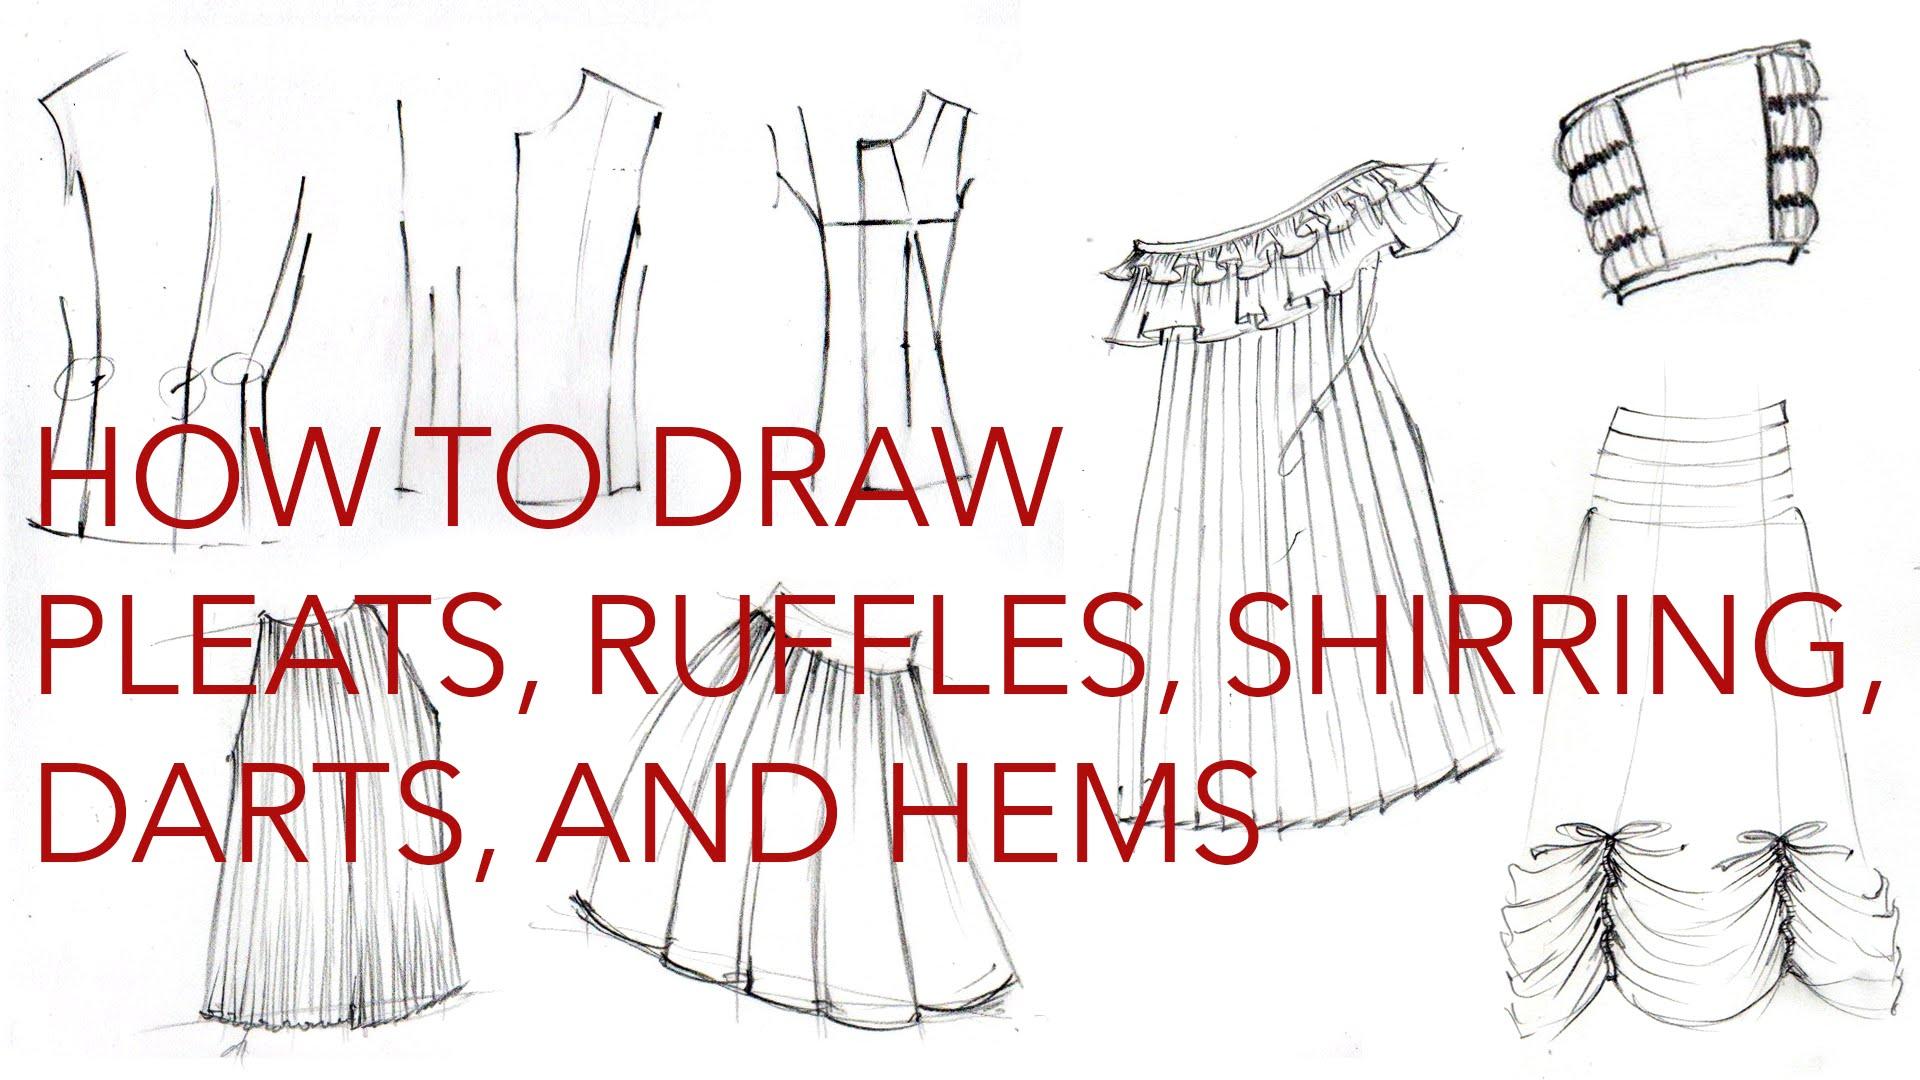 1920x1080 Drawing Clothes 3 Pleats, Ruffles, Hems, Darts